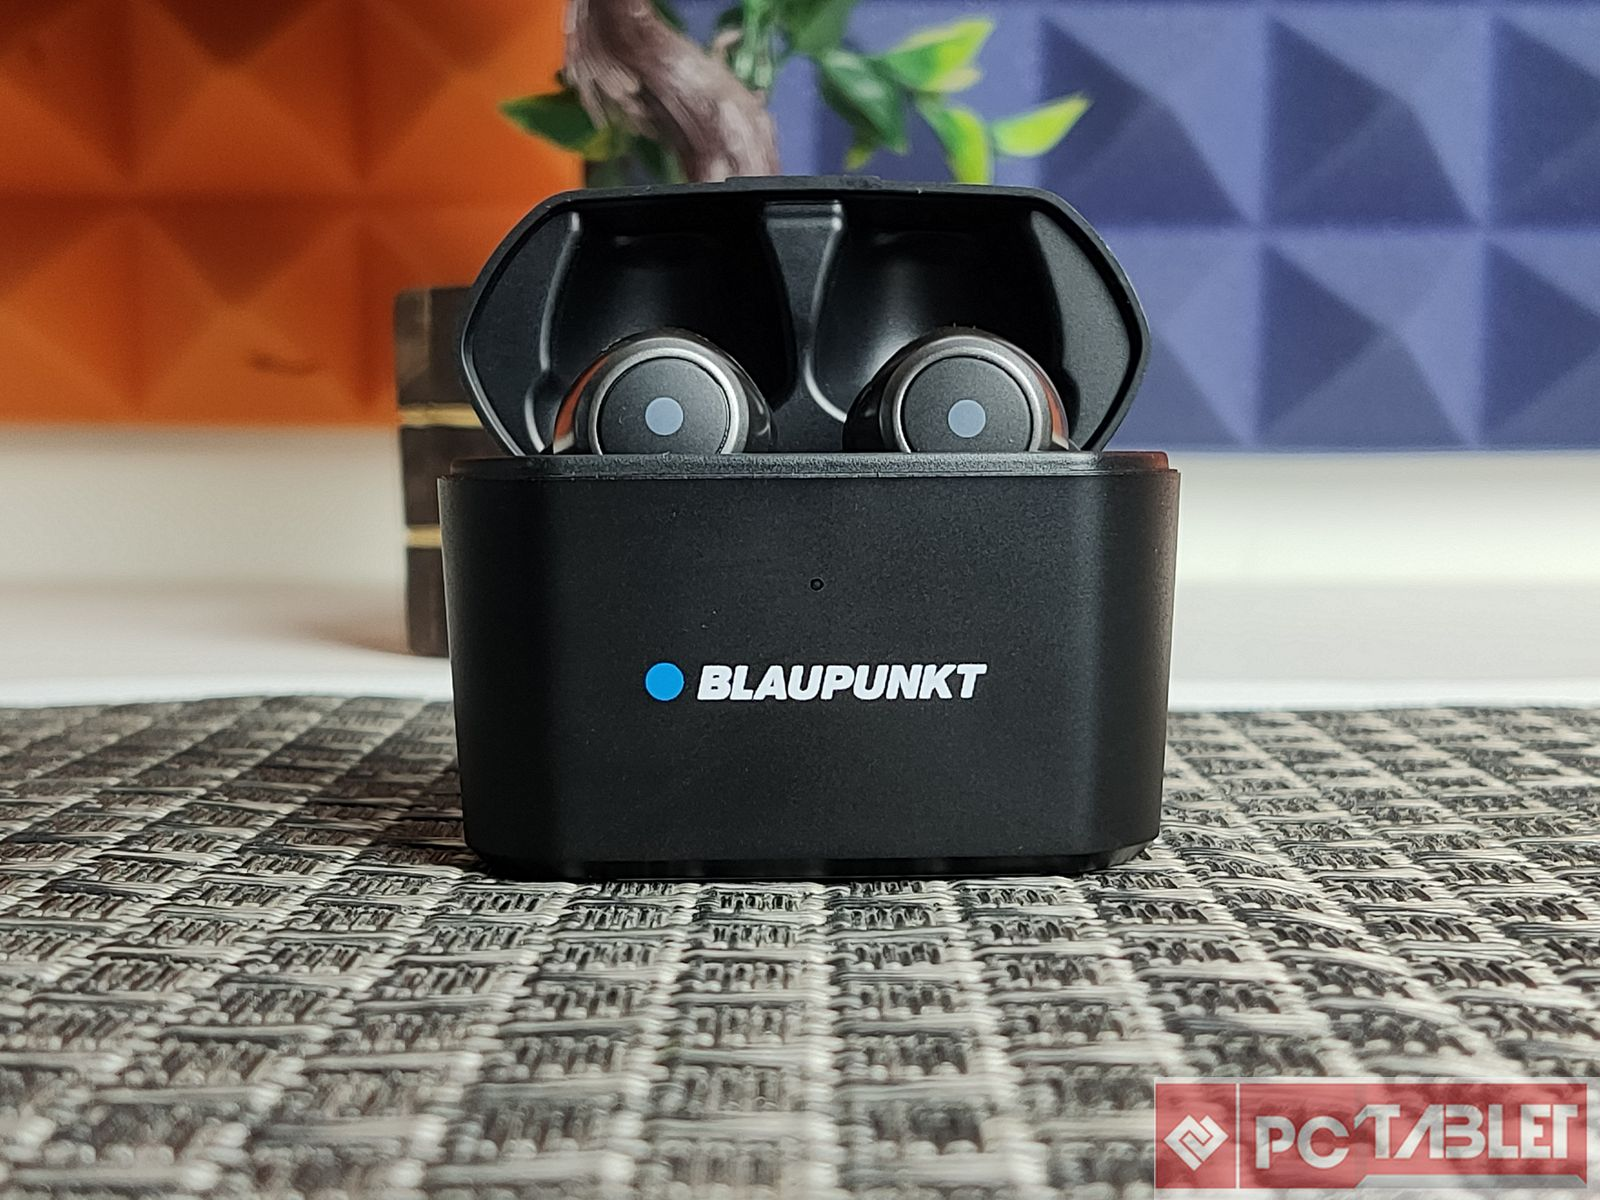 Blaupunkt BTW Pro Truly Wireless Earbuds Review 3